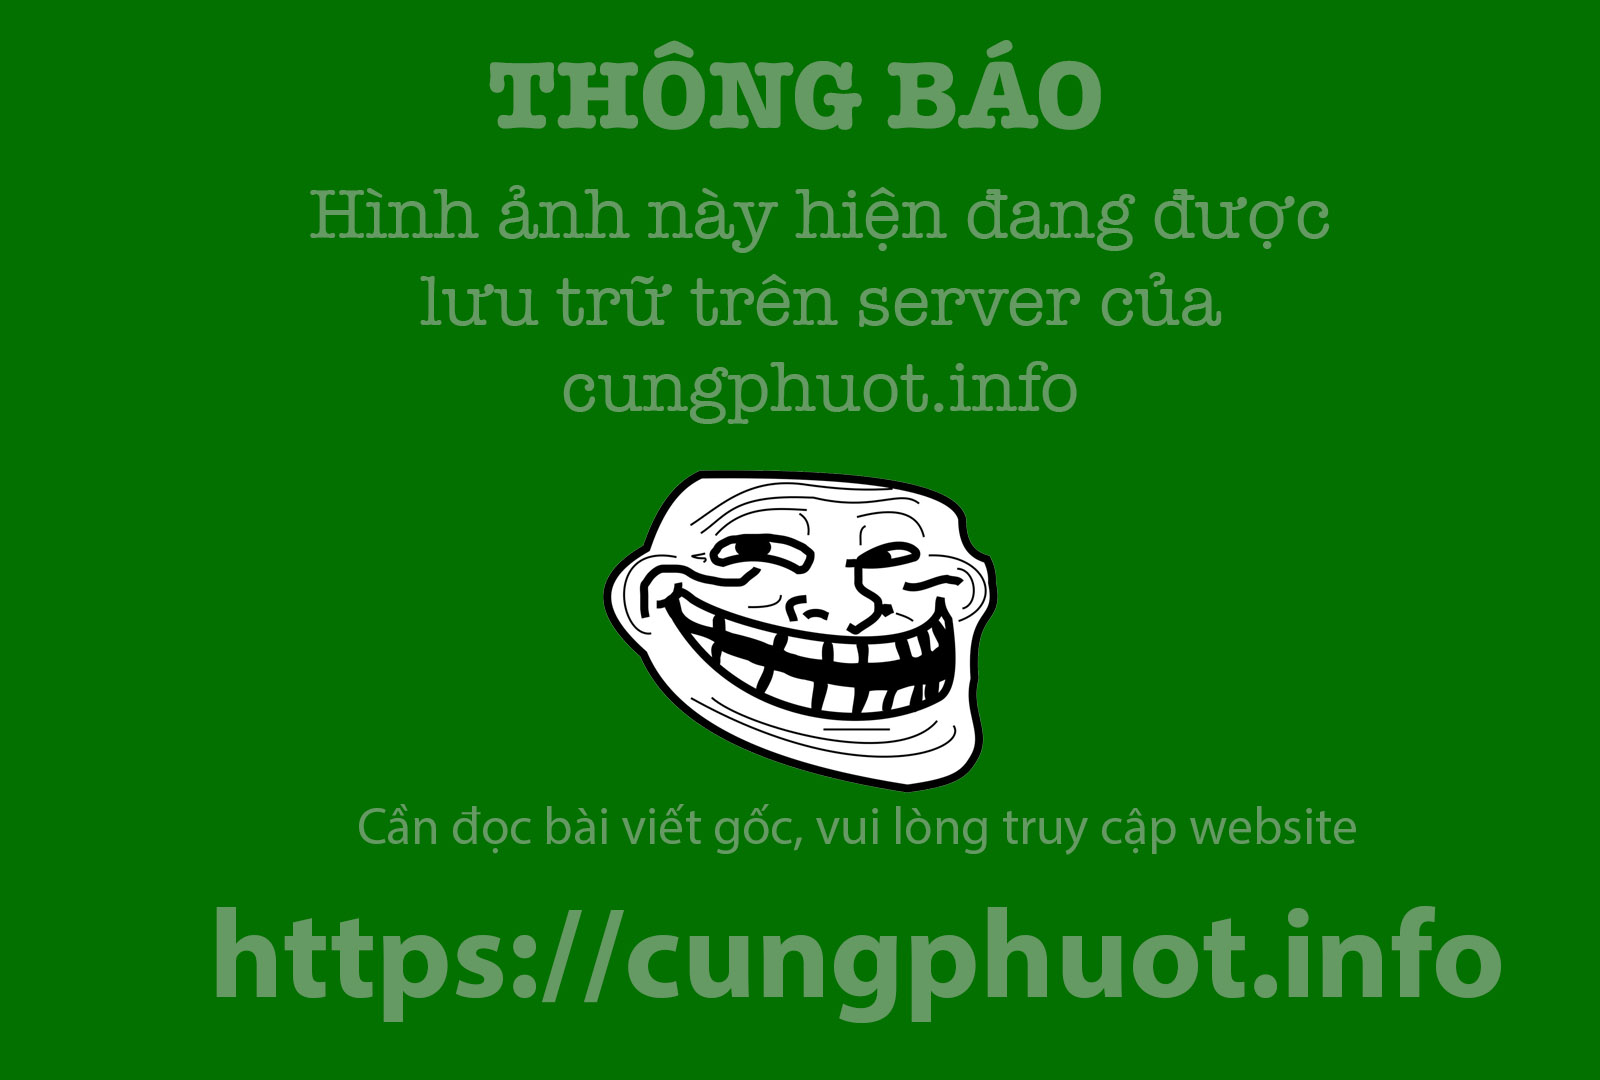 Co do Hue dep la trong suong mu hinh anh 5